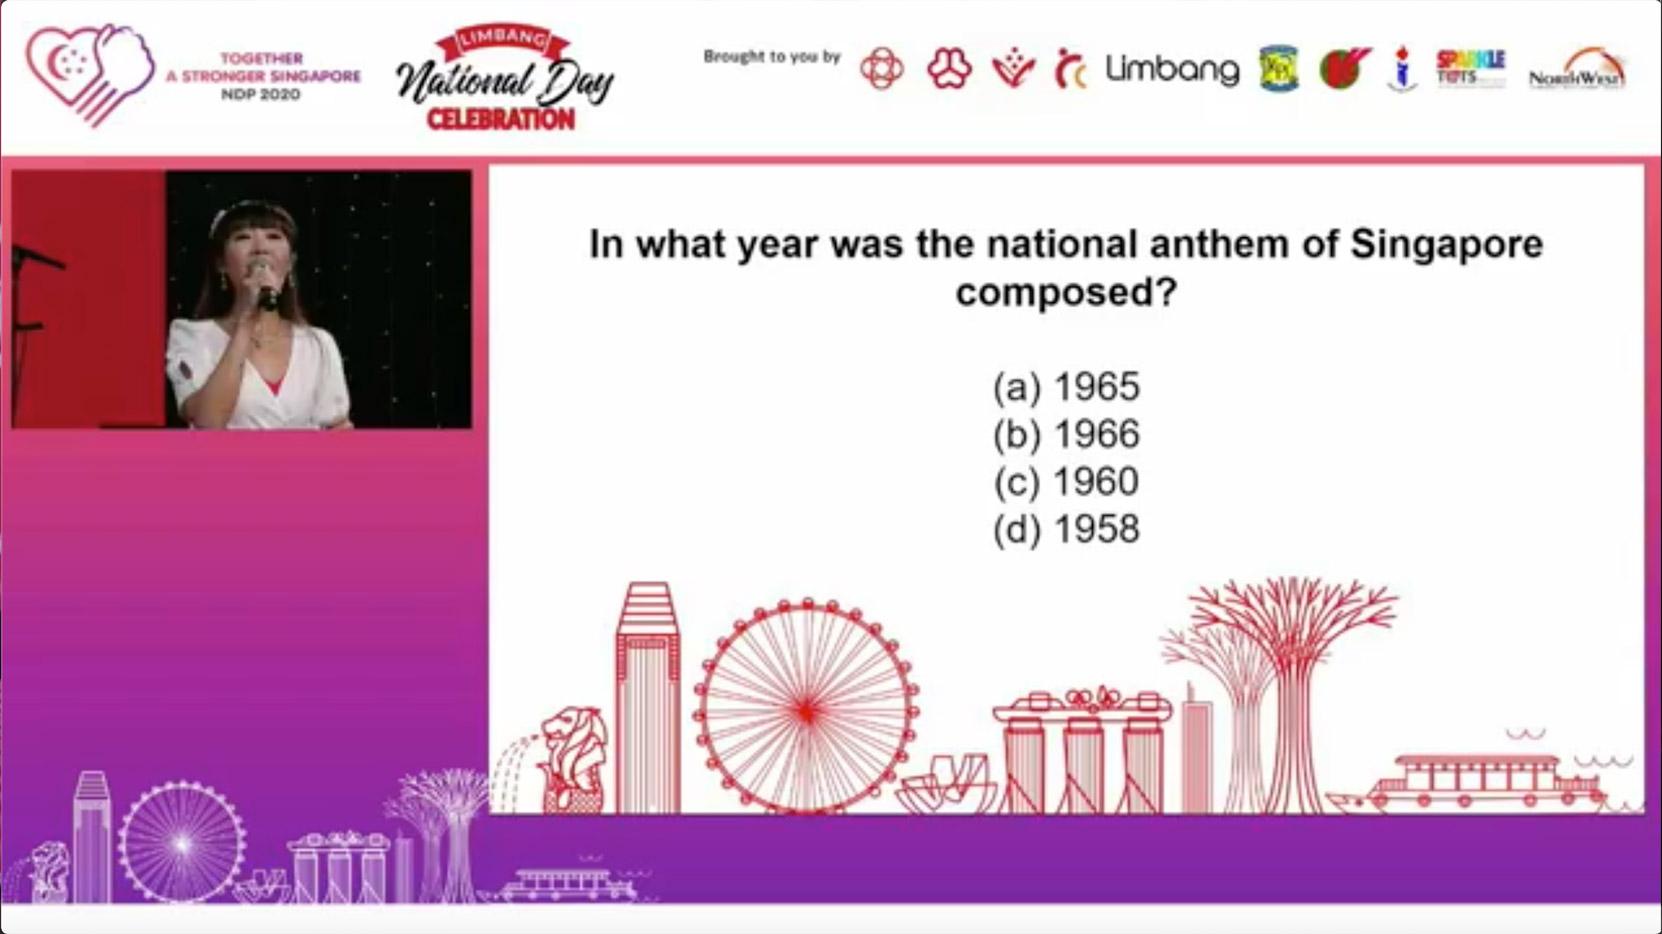 Limbang-national-day-celebration-virtual-event-singapore-community-event-event-company-3